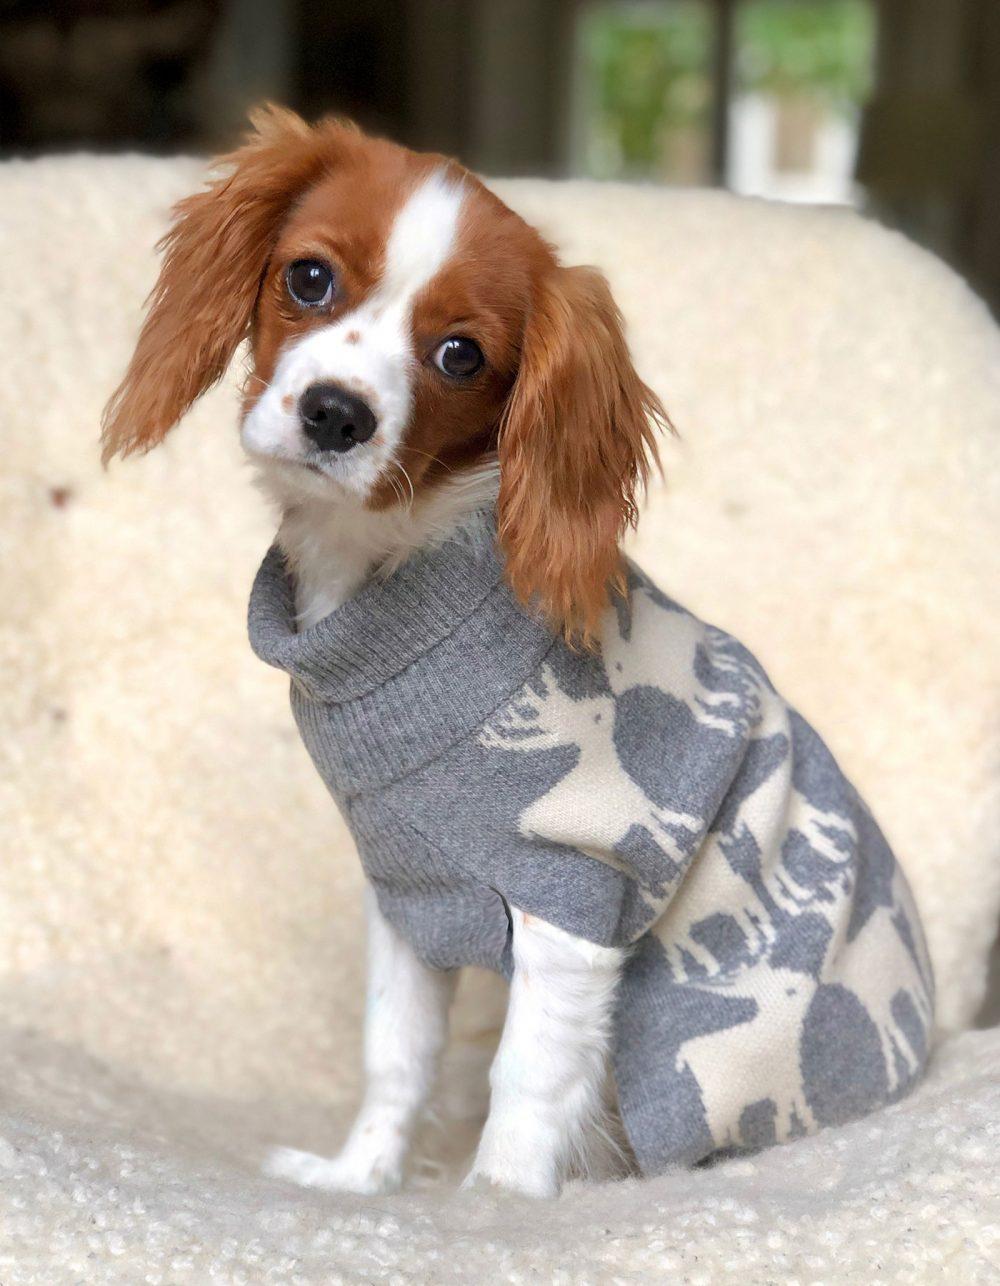 Small dog in pets designer cashmere, the malin darlin cashmere dog sweater.